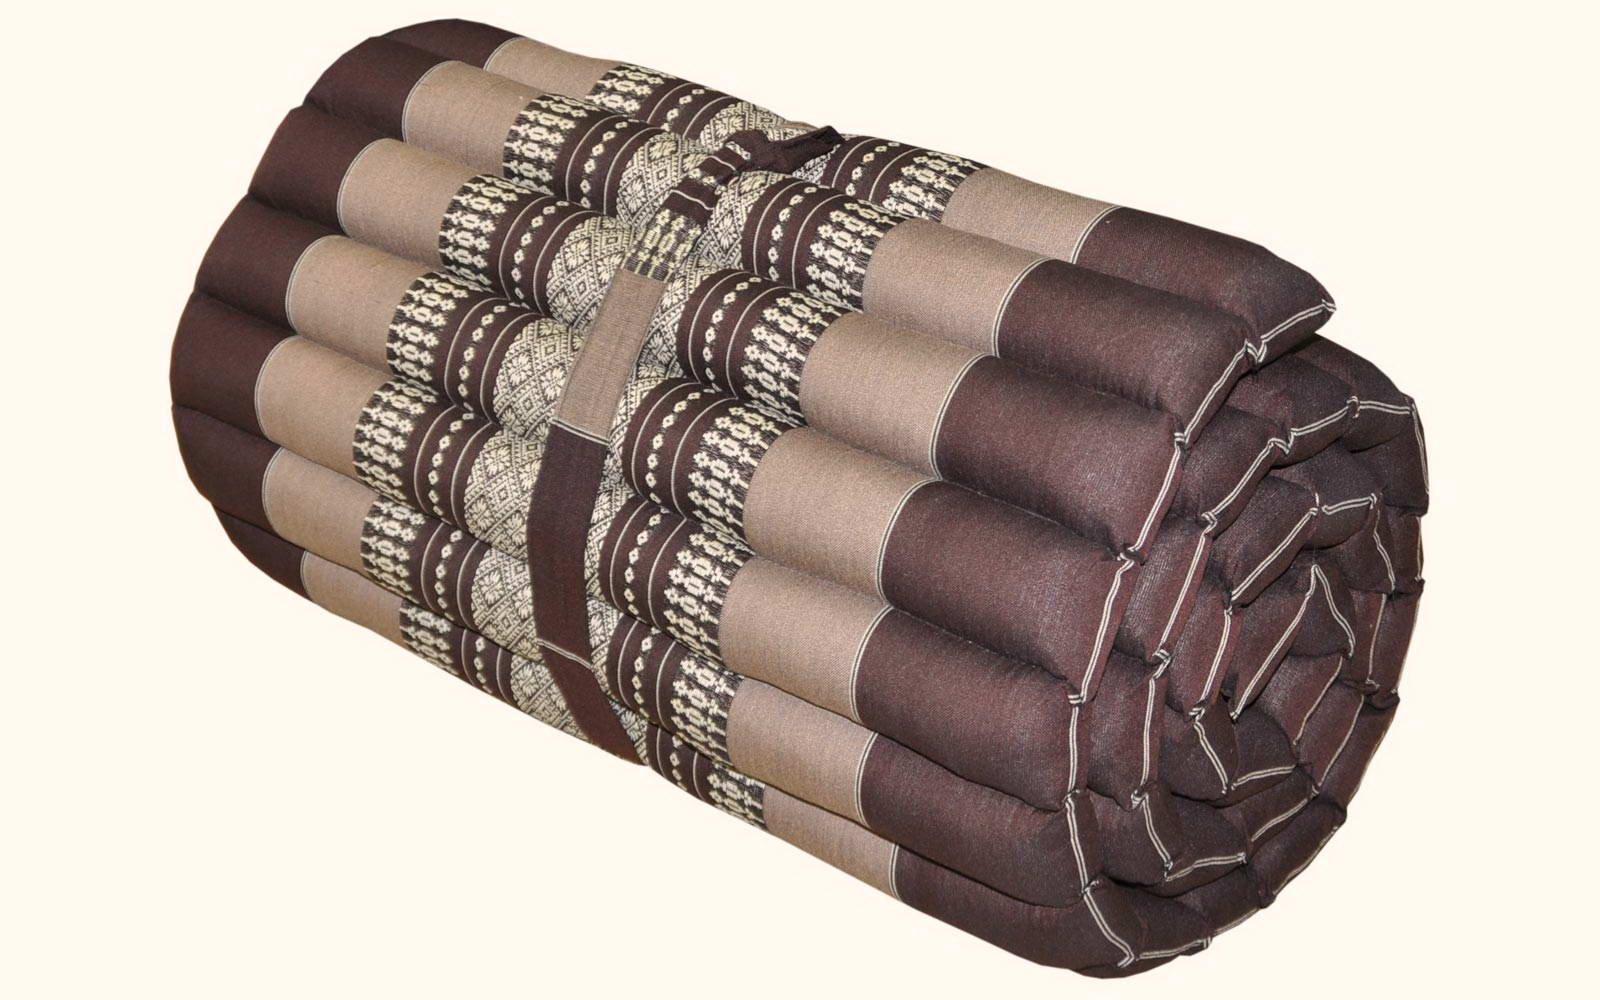 Thai mattress small size (55/180), brown, relaxation, beach cushion, pool, meditation, yoga (82413) by Wilai GmbH